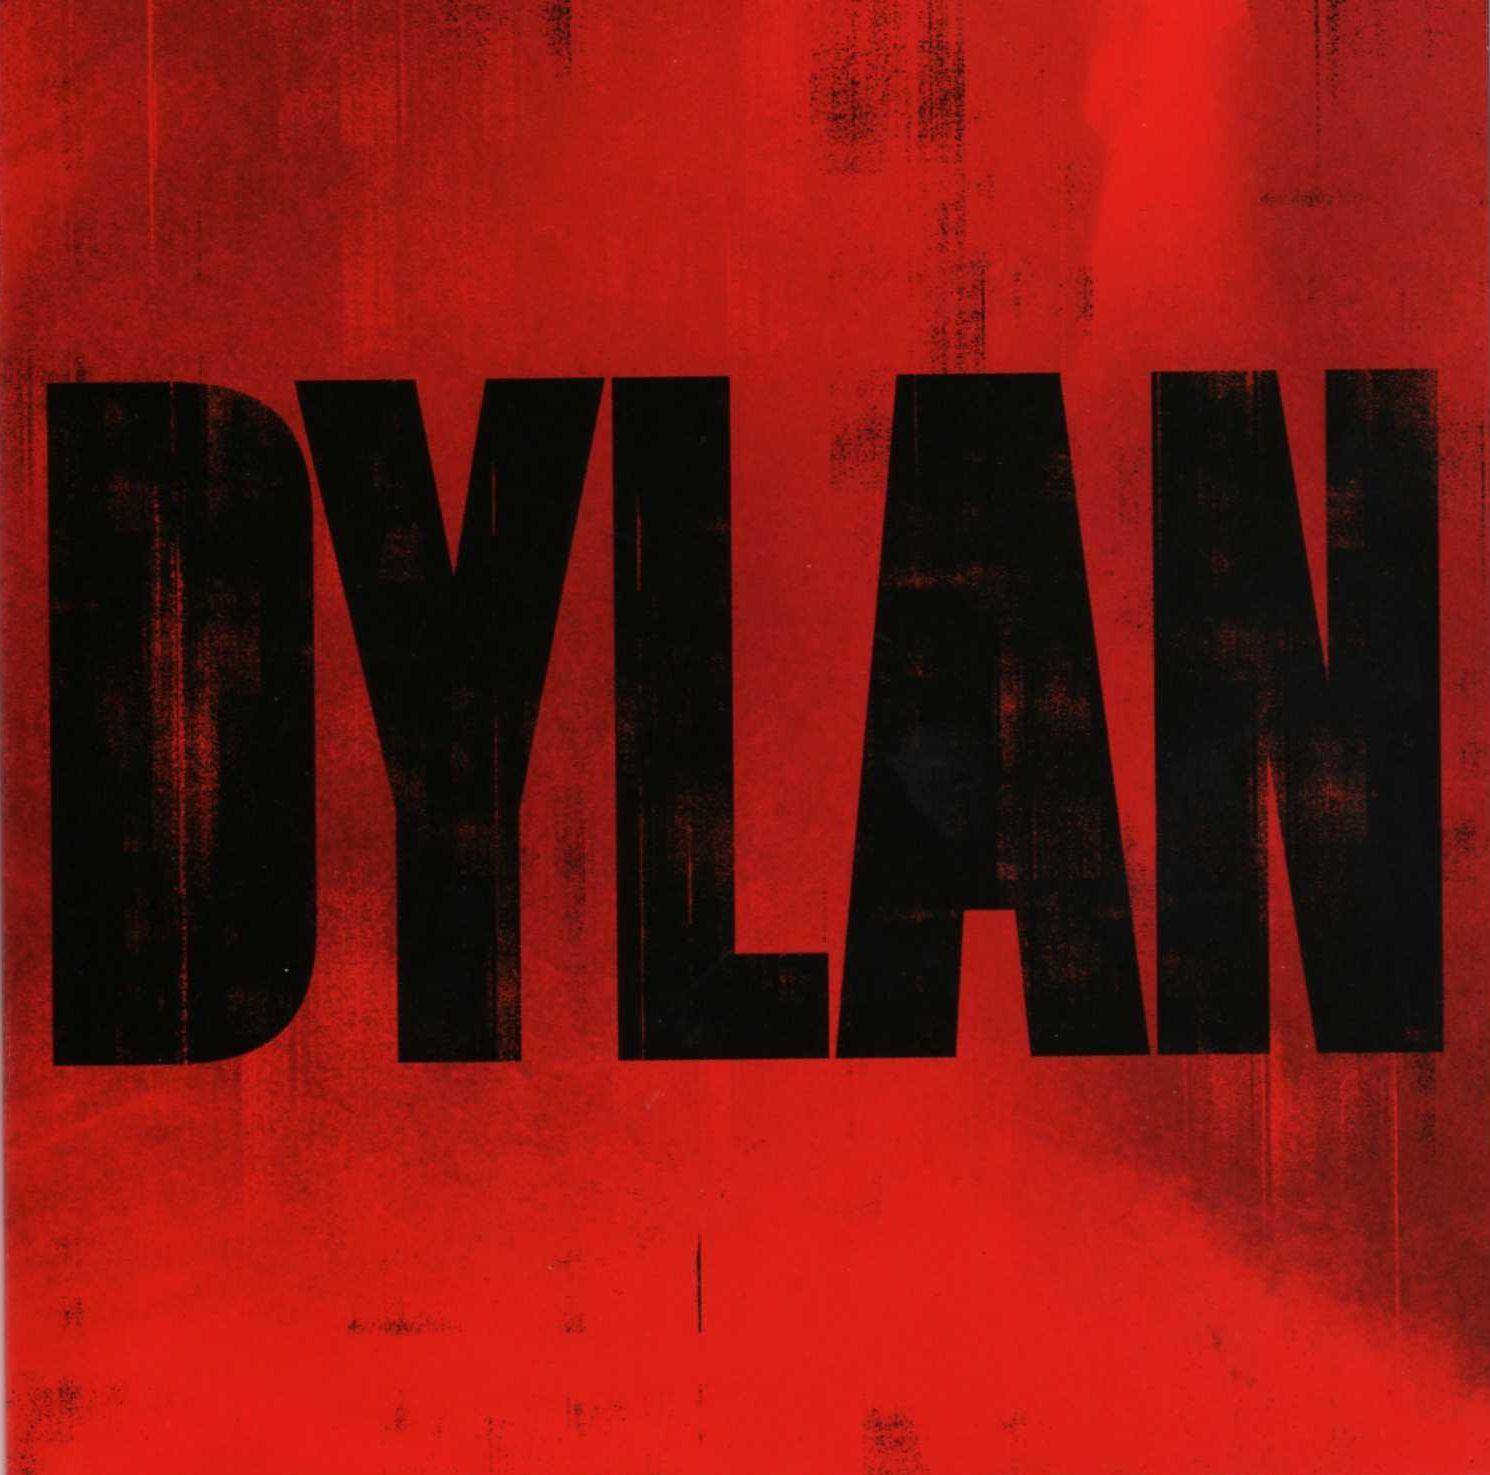 Bob Dylan - Dylan album cover